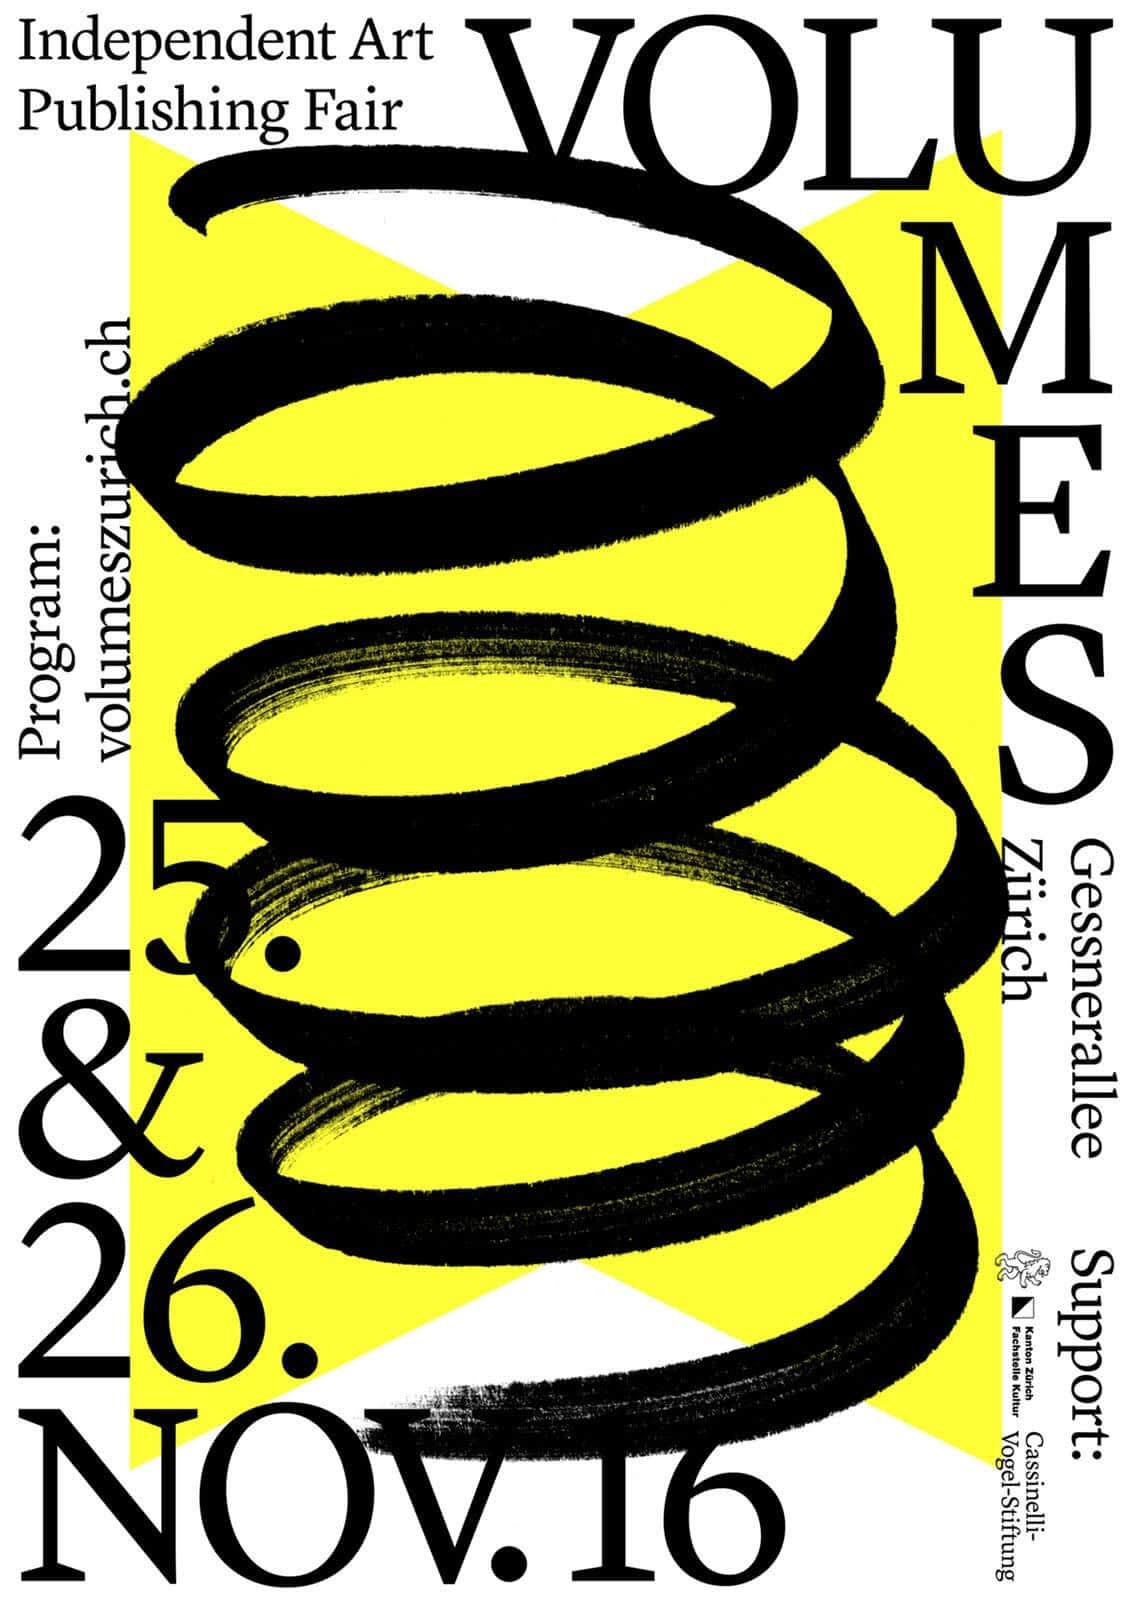 BOLO Paper @ VOLUMES 2016, Independent Art Publishing Fair, Zurich